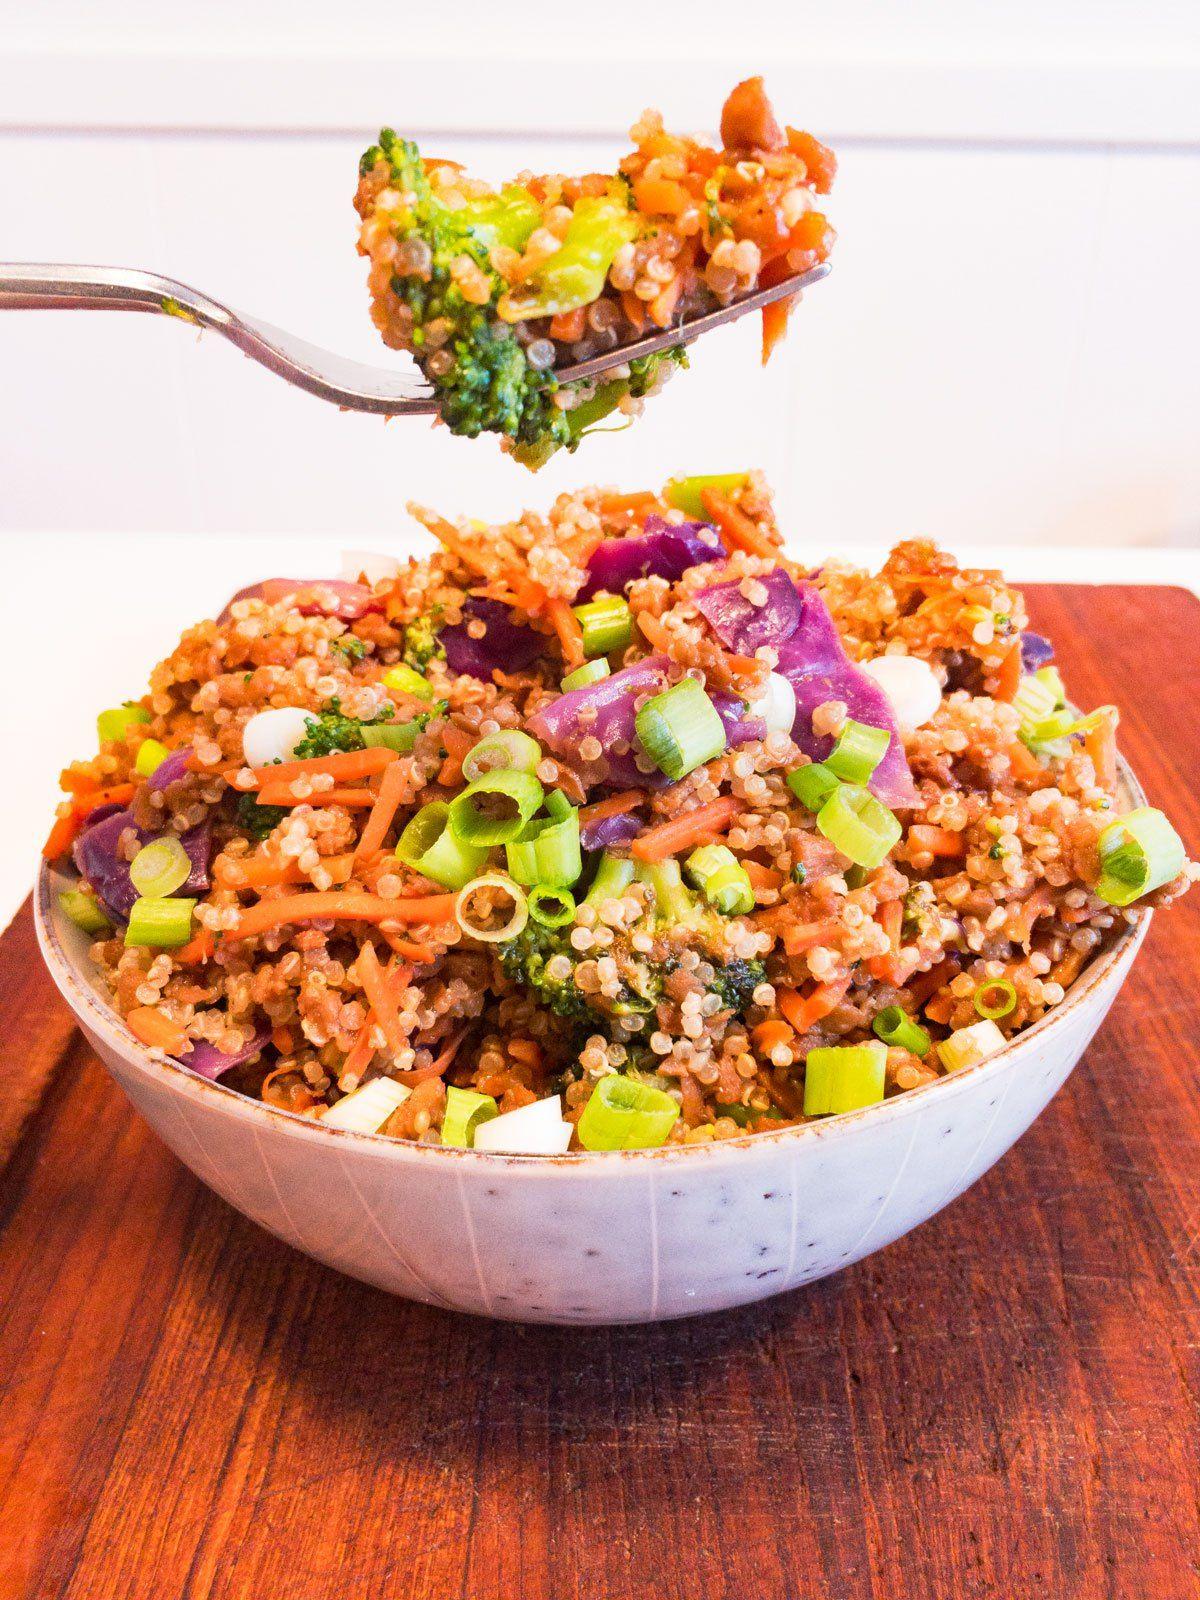 Vegan Beef Quinoa Bowl 1 Pkg Trader Joe S Beef Less Ground Beef In Deli Section 4 Cups Quinoa Cooked 2 Cups Shredded Vegan Beef Quinoa Bowl Quinoa Bowl Recipe